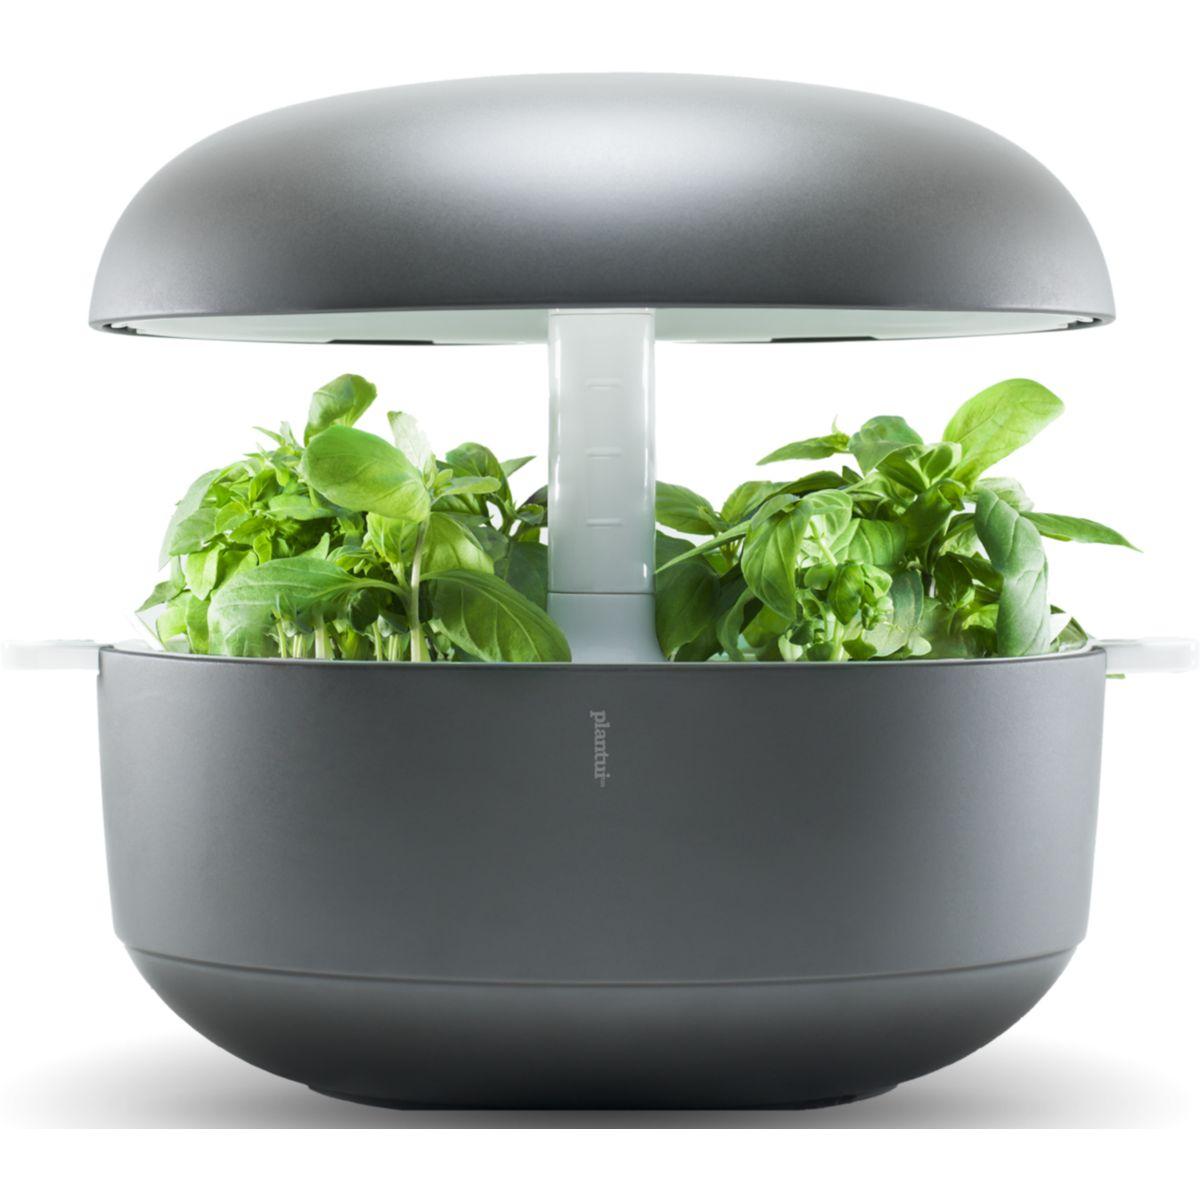 Jardin d'intérieur PLANTUI 6 Smart Garden Gris